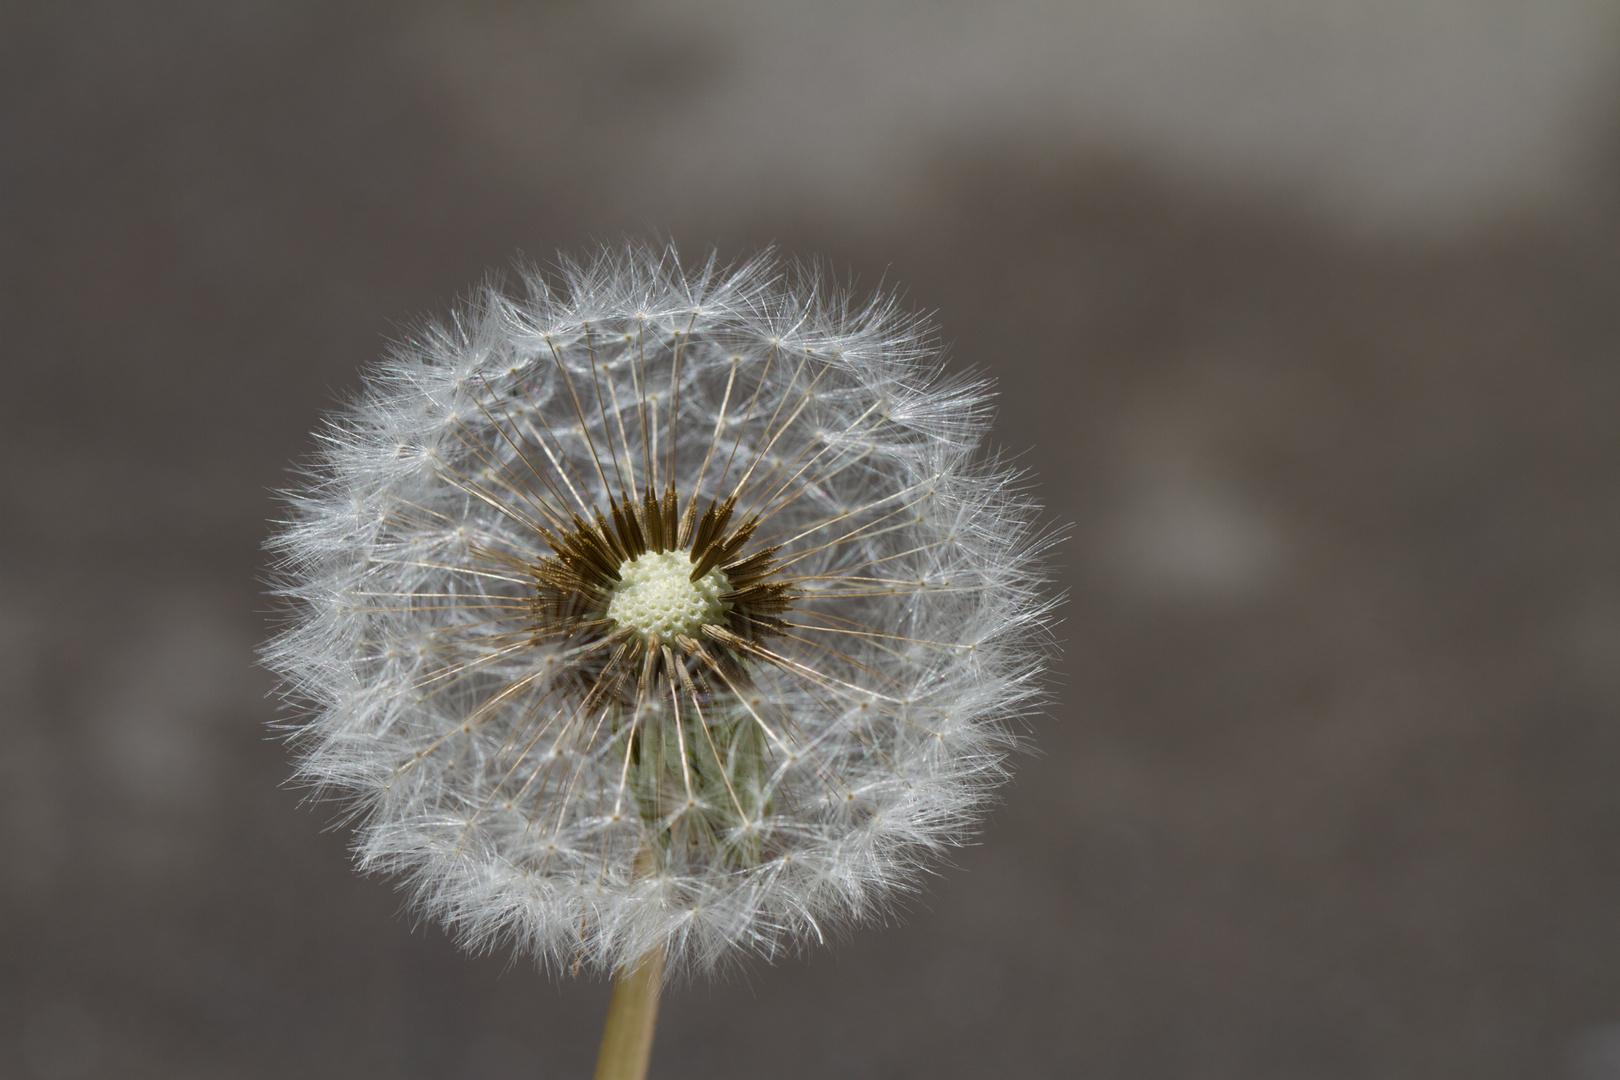 Ripe fruits of a dandelion - Pusteblume